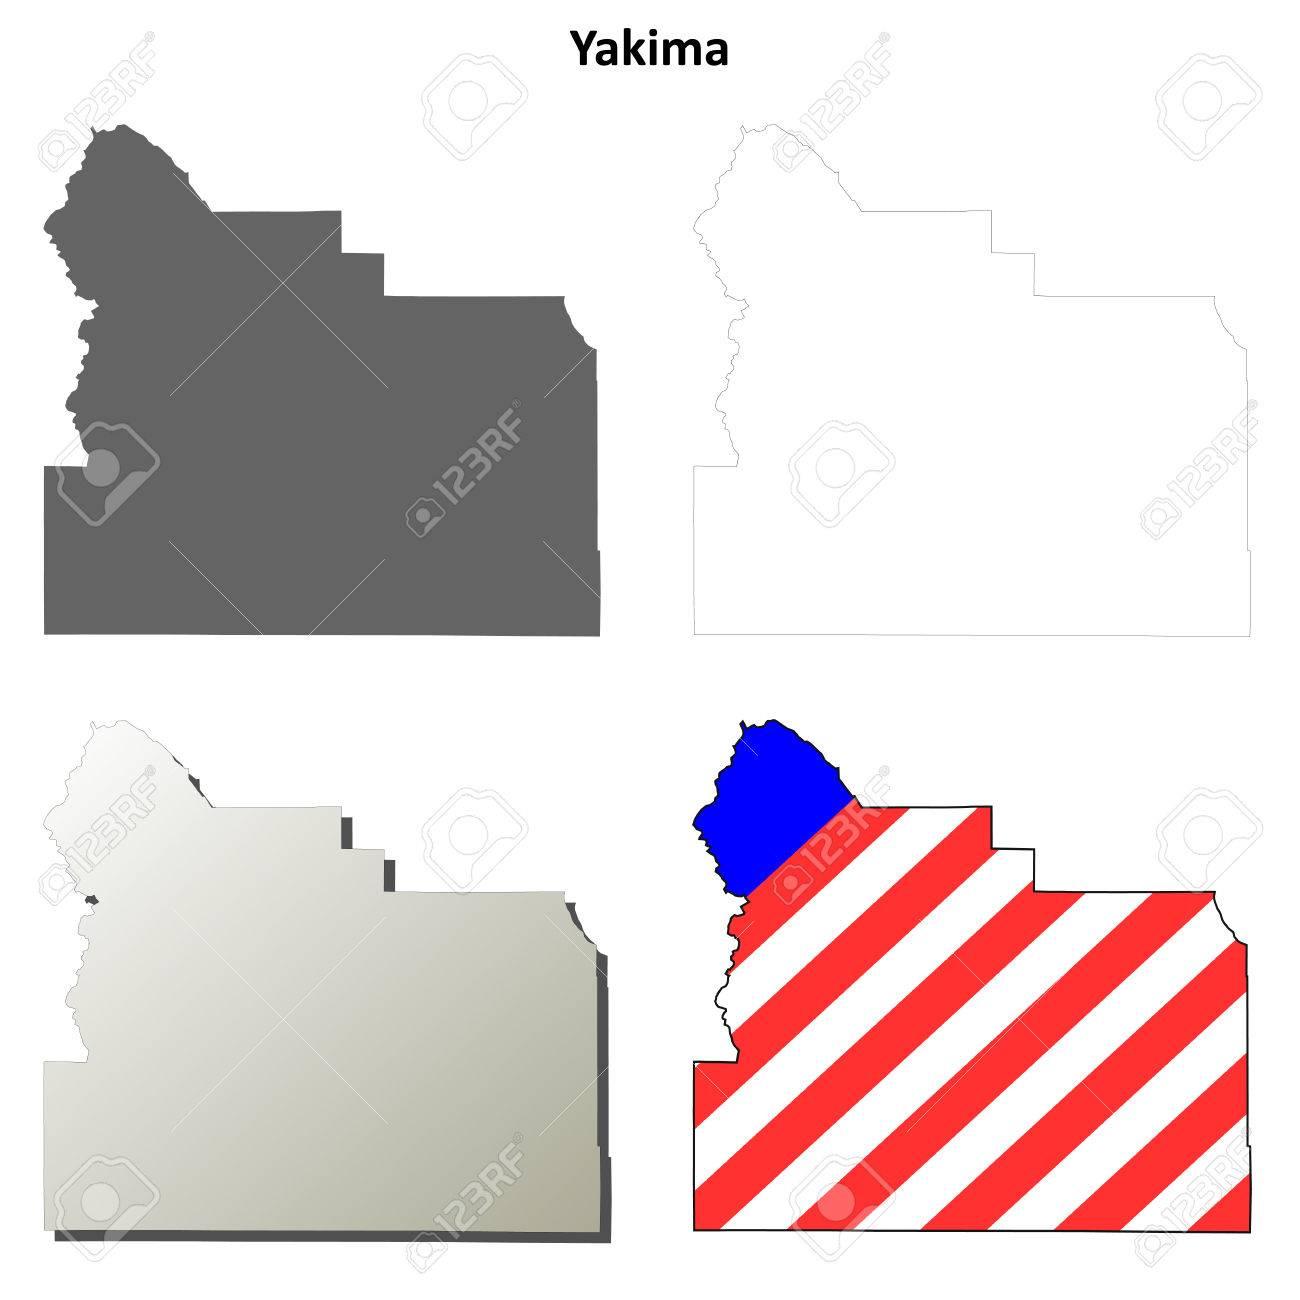 Yakima County, Washington blank outline map set on whatcom county, yakima wa history, northwest ga county map, pierce county, wenatchee county map, spokane county, san juan county, lewis county, grays harbor county, yakima area wineries, roosevelt county map, chelan county map, columbia county, yakima weather, yakima union gap wa, lincoln county, skagit county, clark county map, yakima washington, snohomish county, yakima indian clothing, charlottesville county map, king county, okanogan county, ketchikan county map, mount rainier national park map, jefferson county, kitsap county, clark county, grant county, benton county, yakima eisenhower high school, yakima mall, washington map, riverside county map, rowan county ky map, franklin county, yakima restaurants,